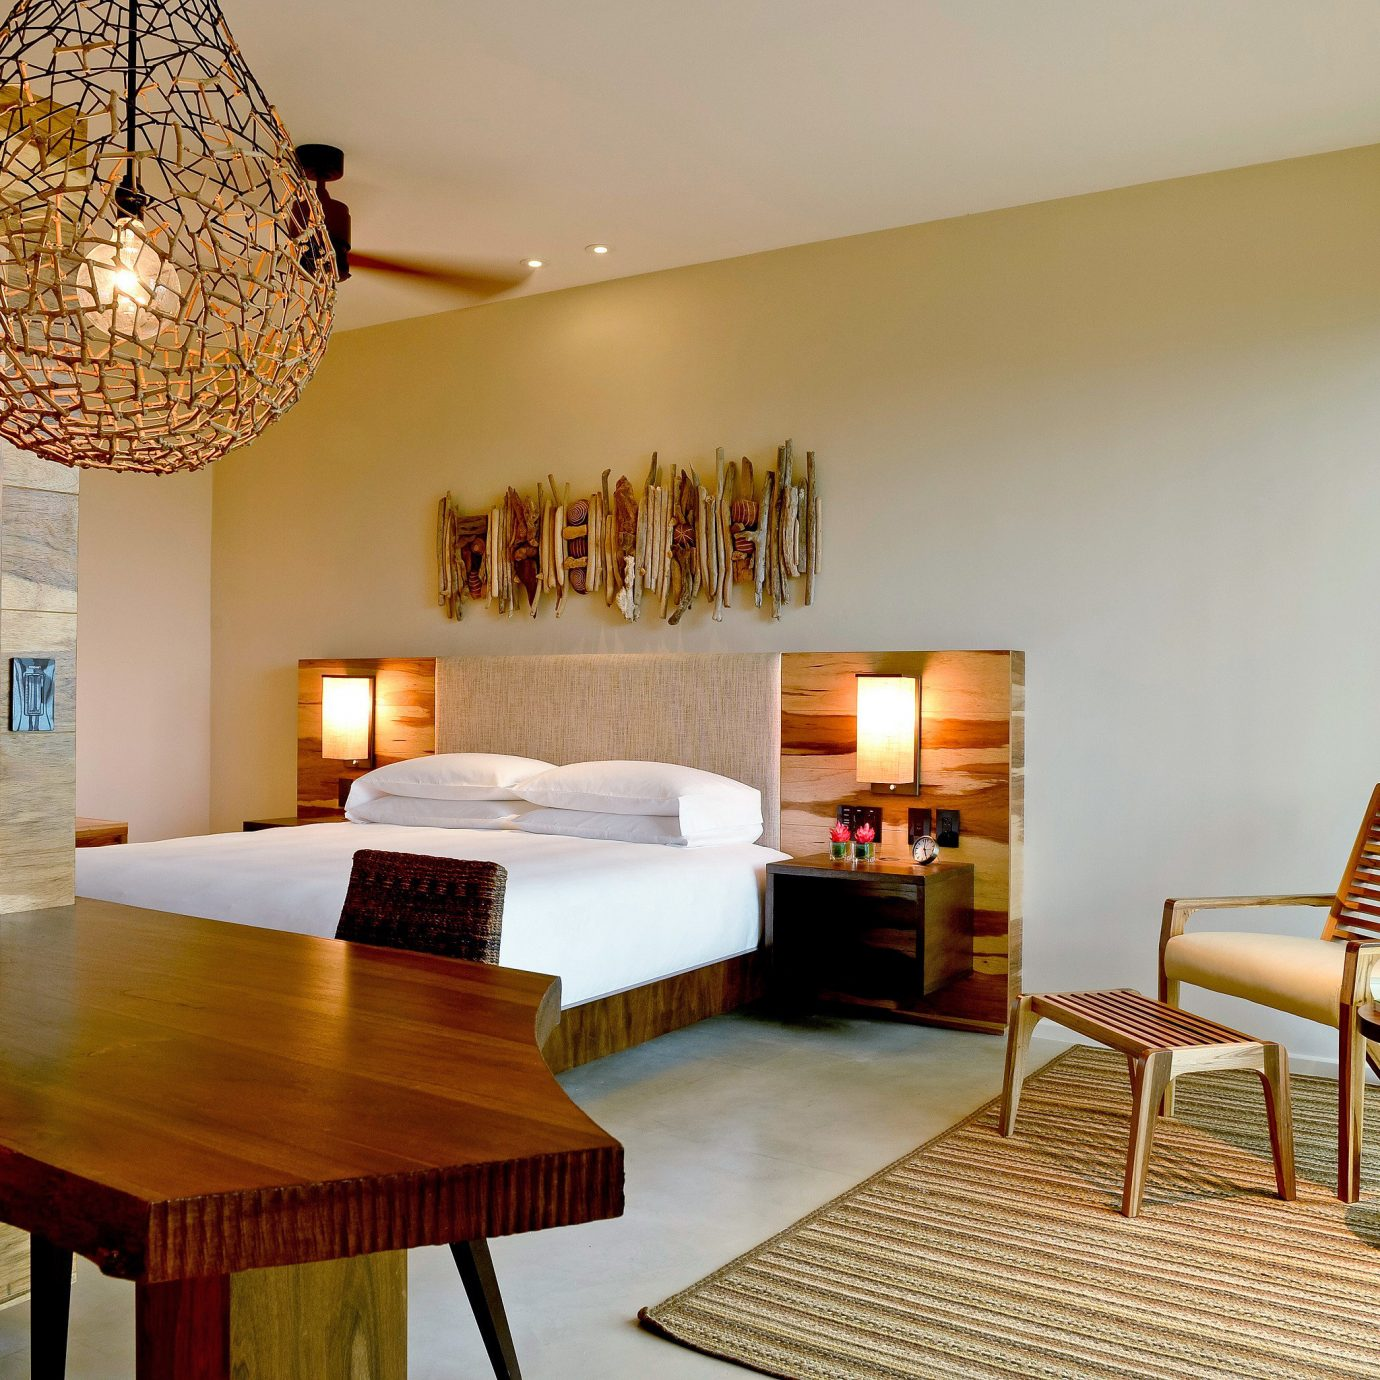 Bedroom Modern Resort property living room Villa home hardwood Suite wooden cottage farmhouse wood flooring dining table